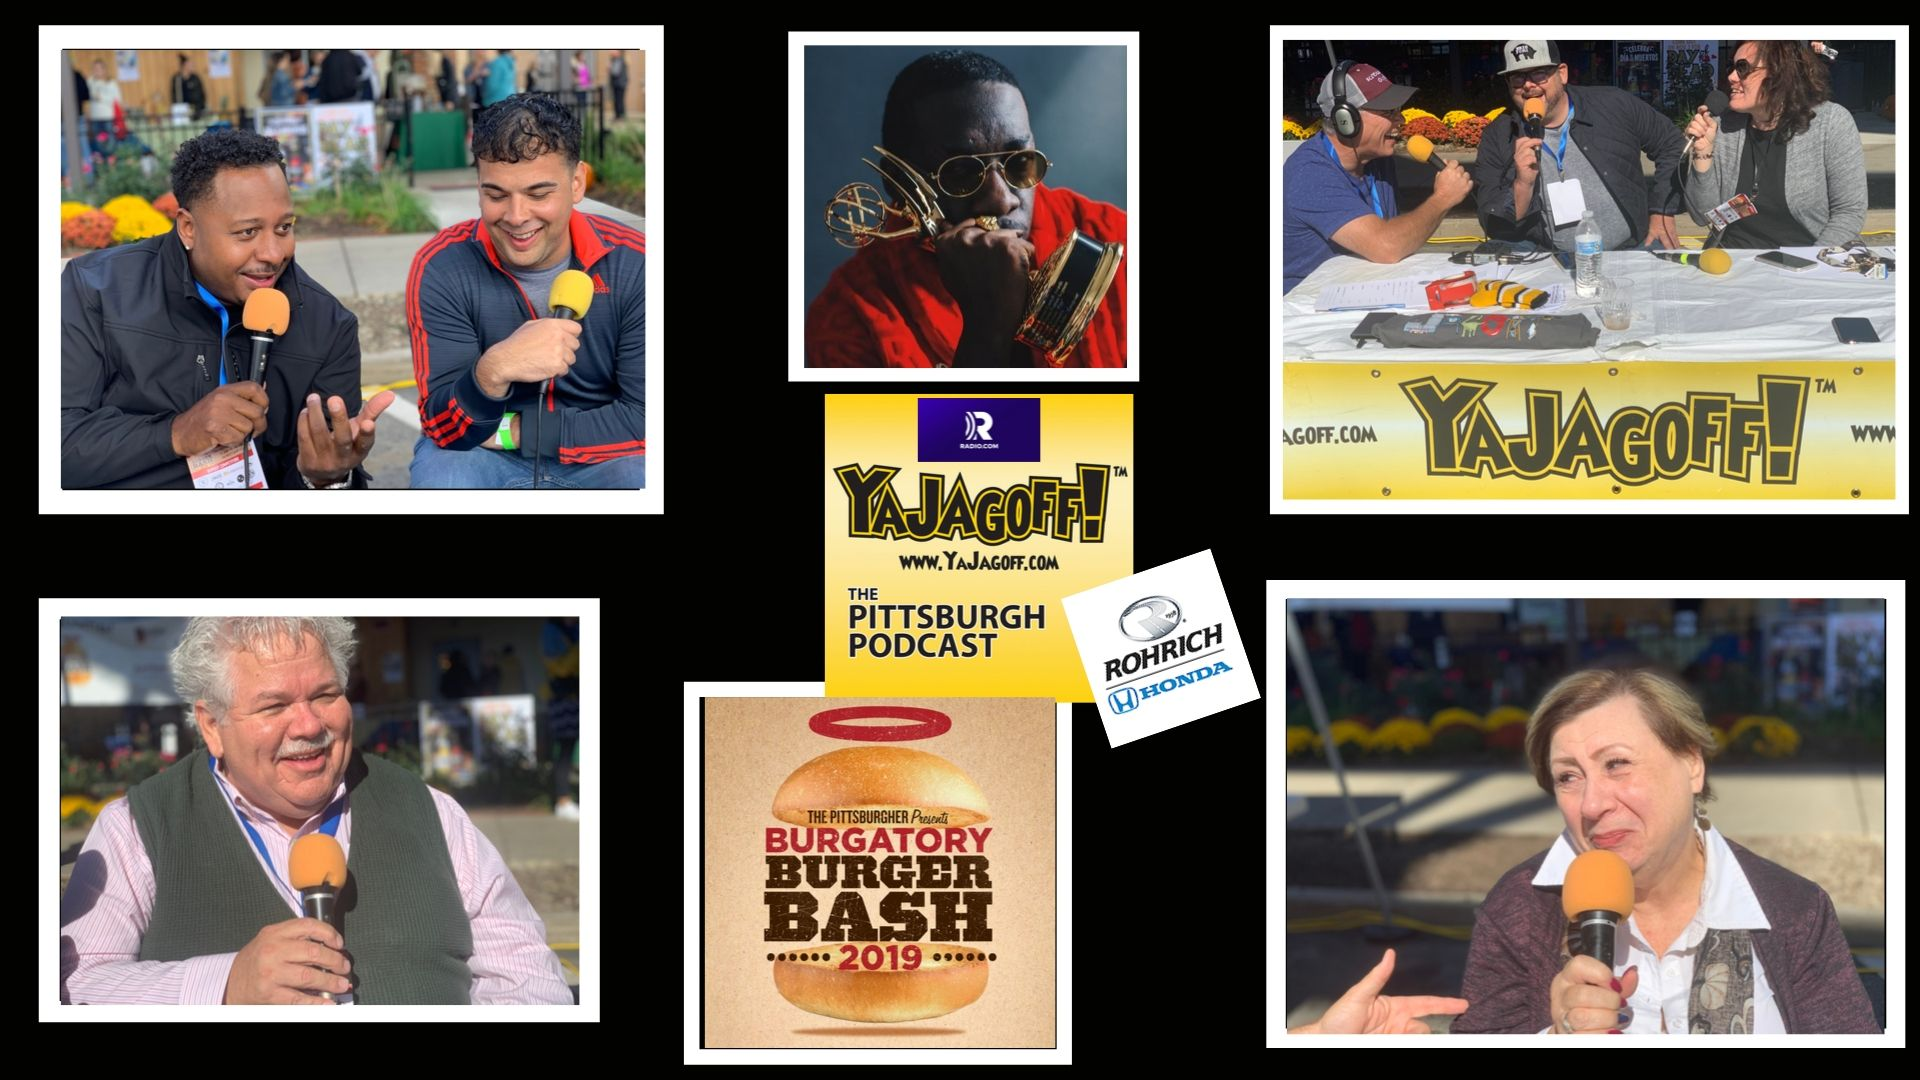 YaJagoff Podcast